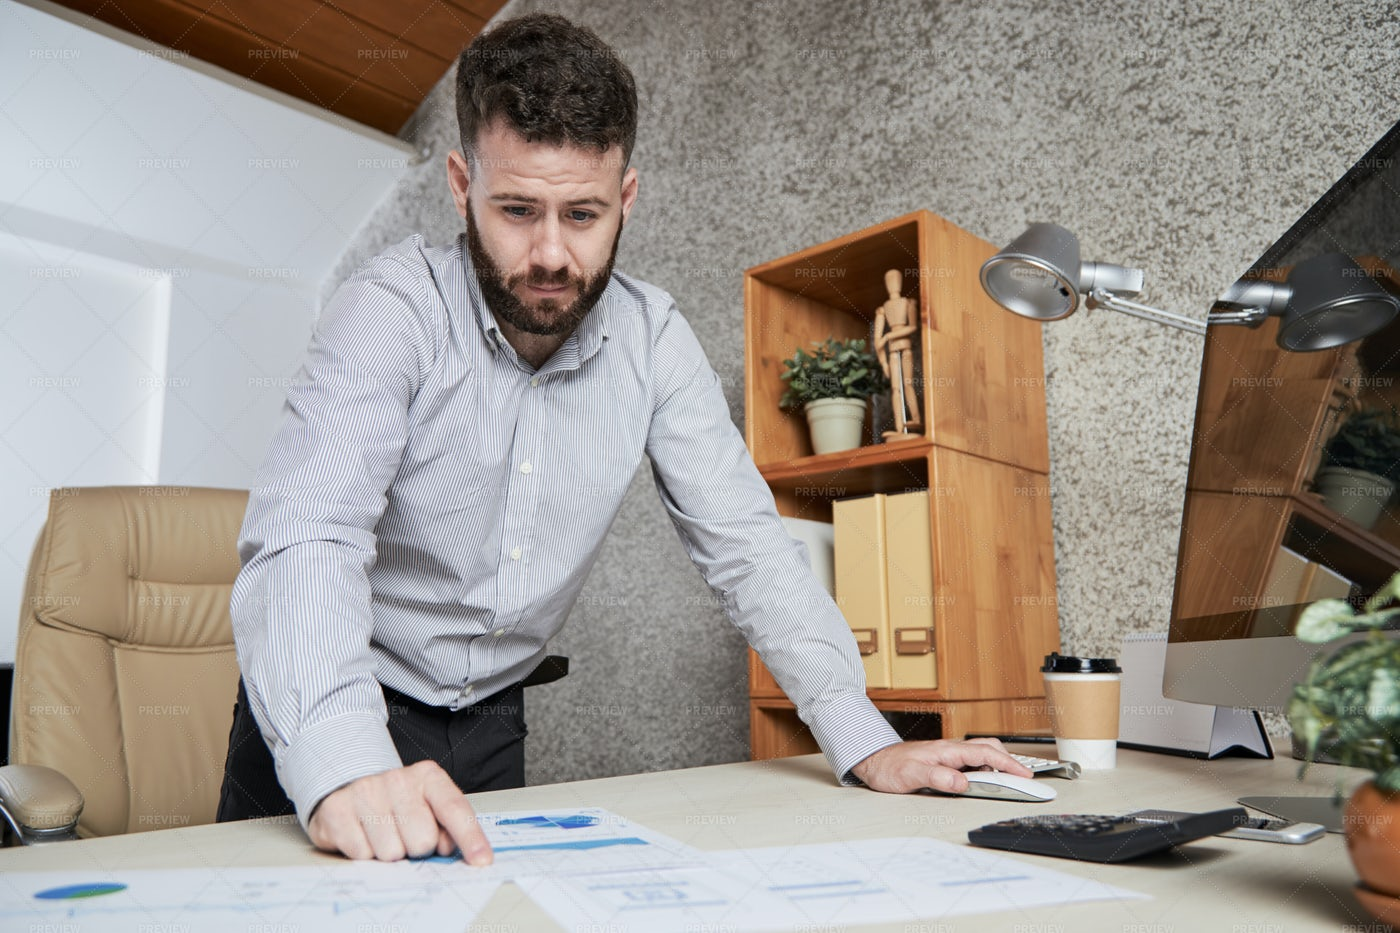 Man Examining Marketing In Business: Stock Photos